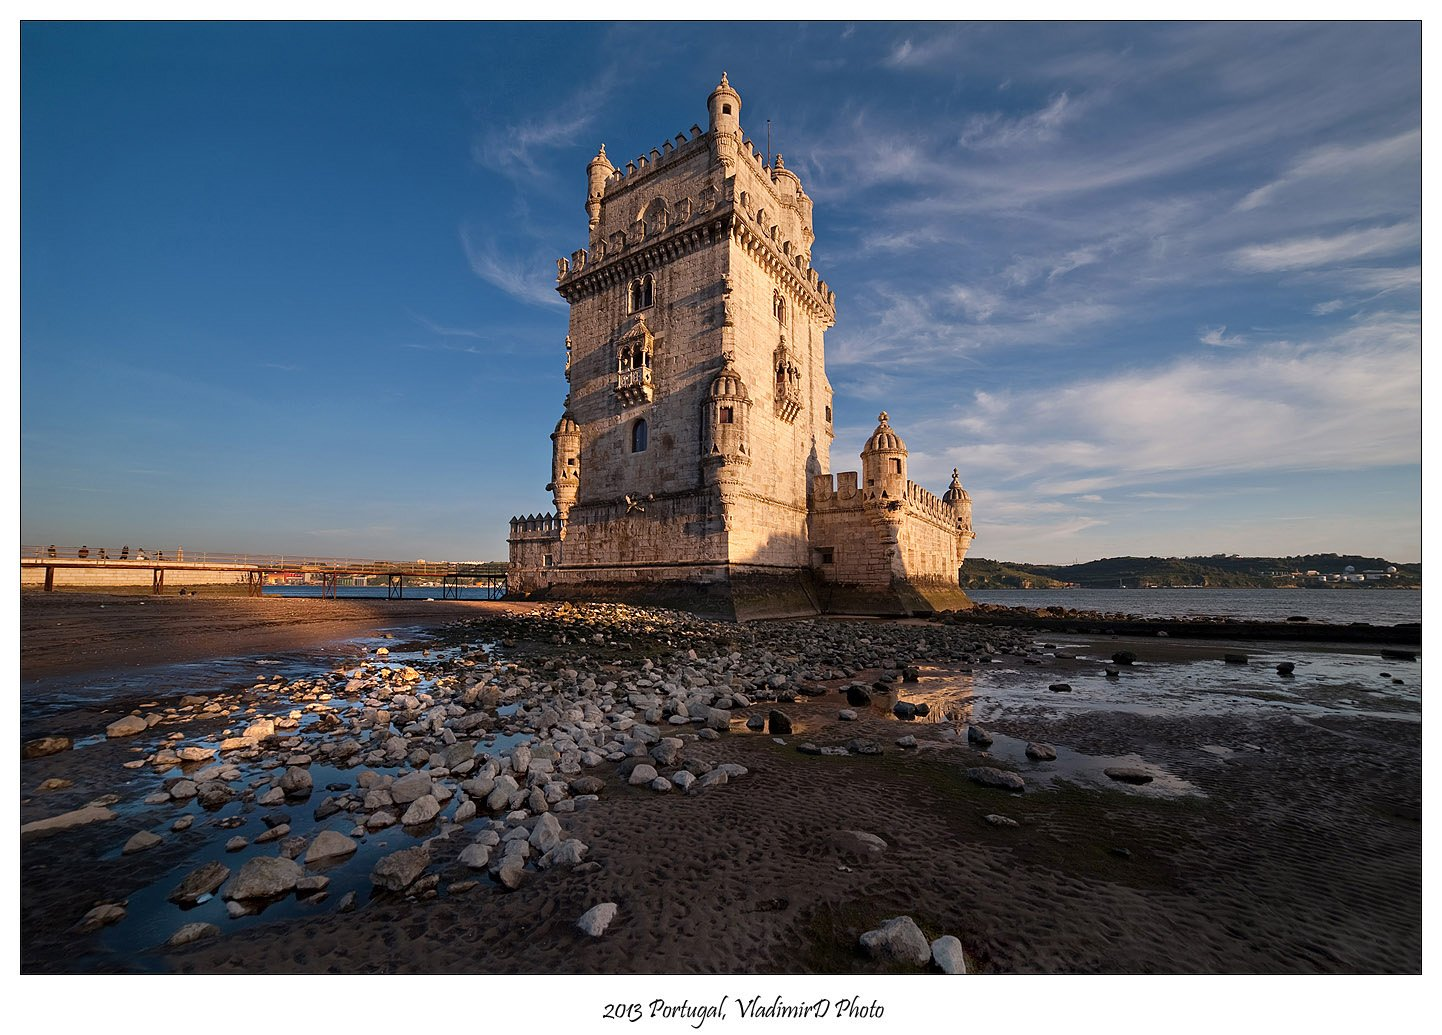 Башня, Белем, Лиссабон, Португалия, VladimirD